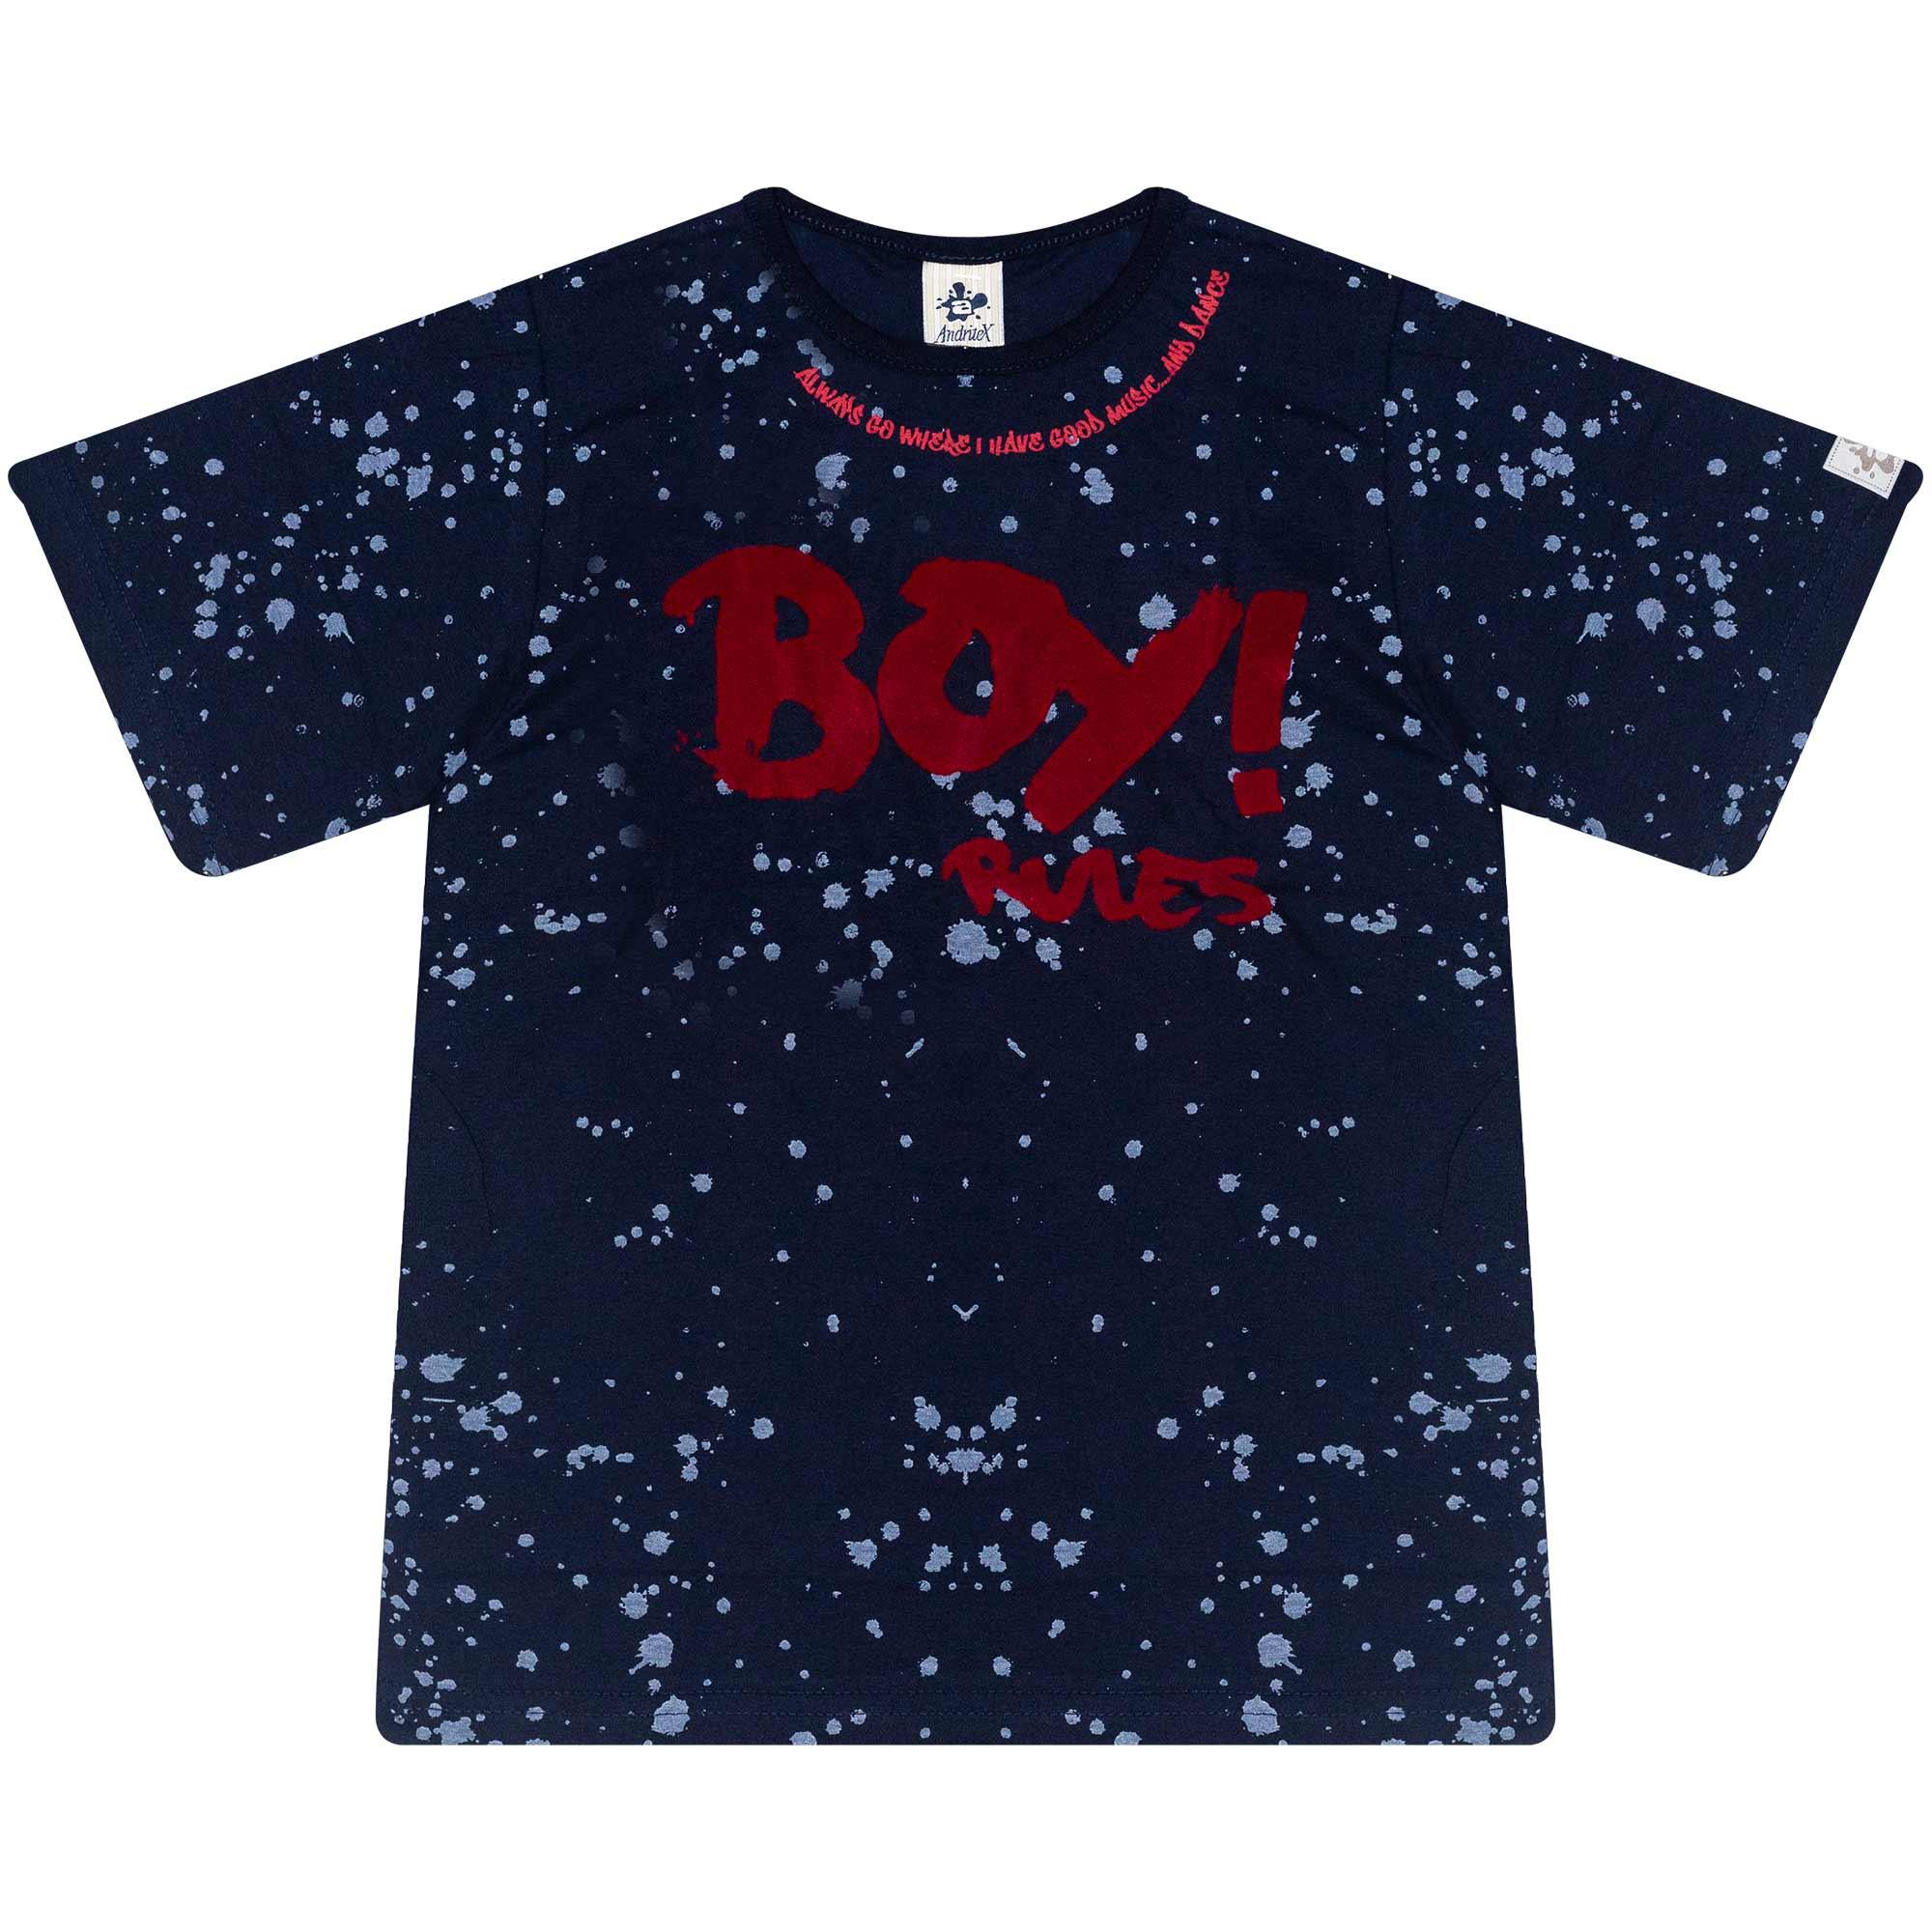 Camiseta Infantil Masculino - Ref 4786  - Azul - Andritex